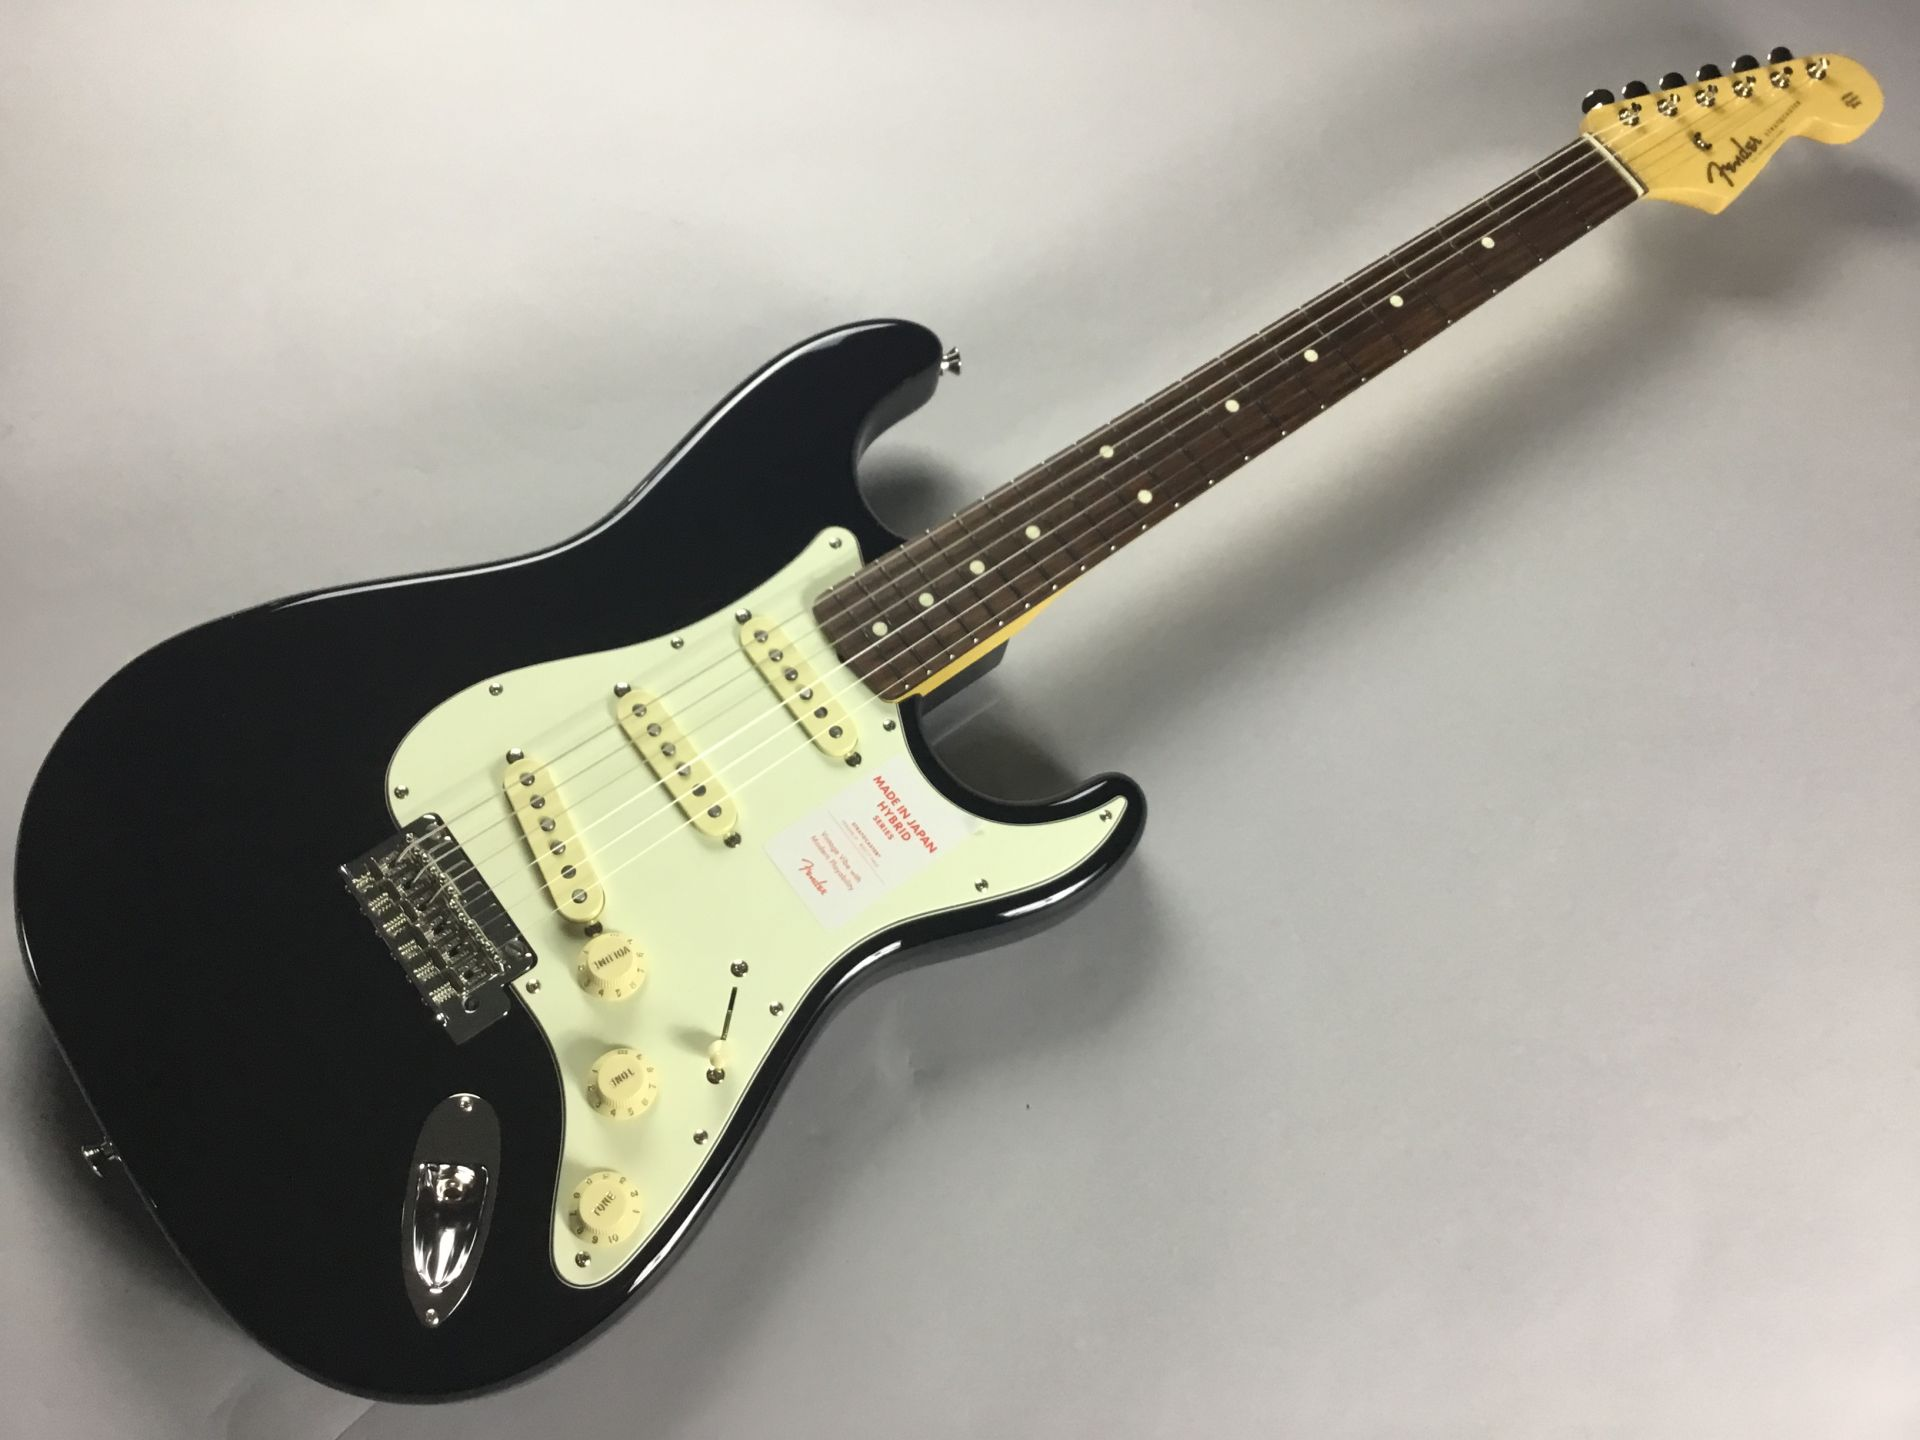 Hybrid 60s Stratocasterのボディトップ-アップ画像